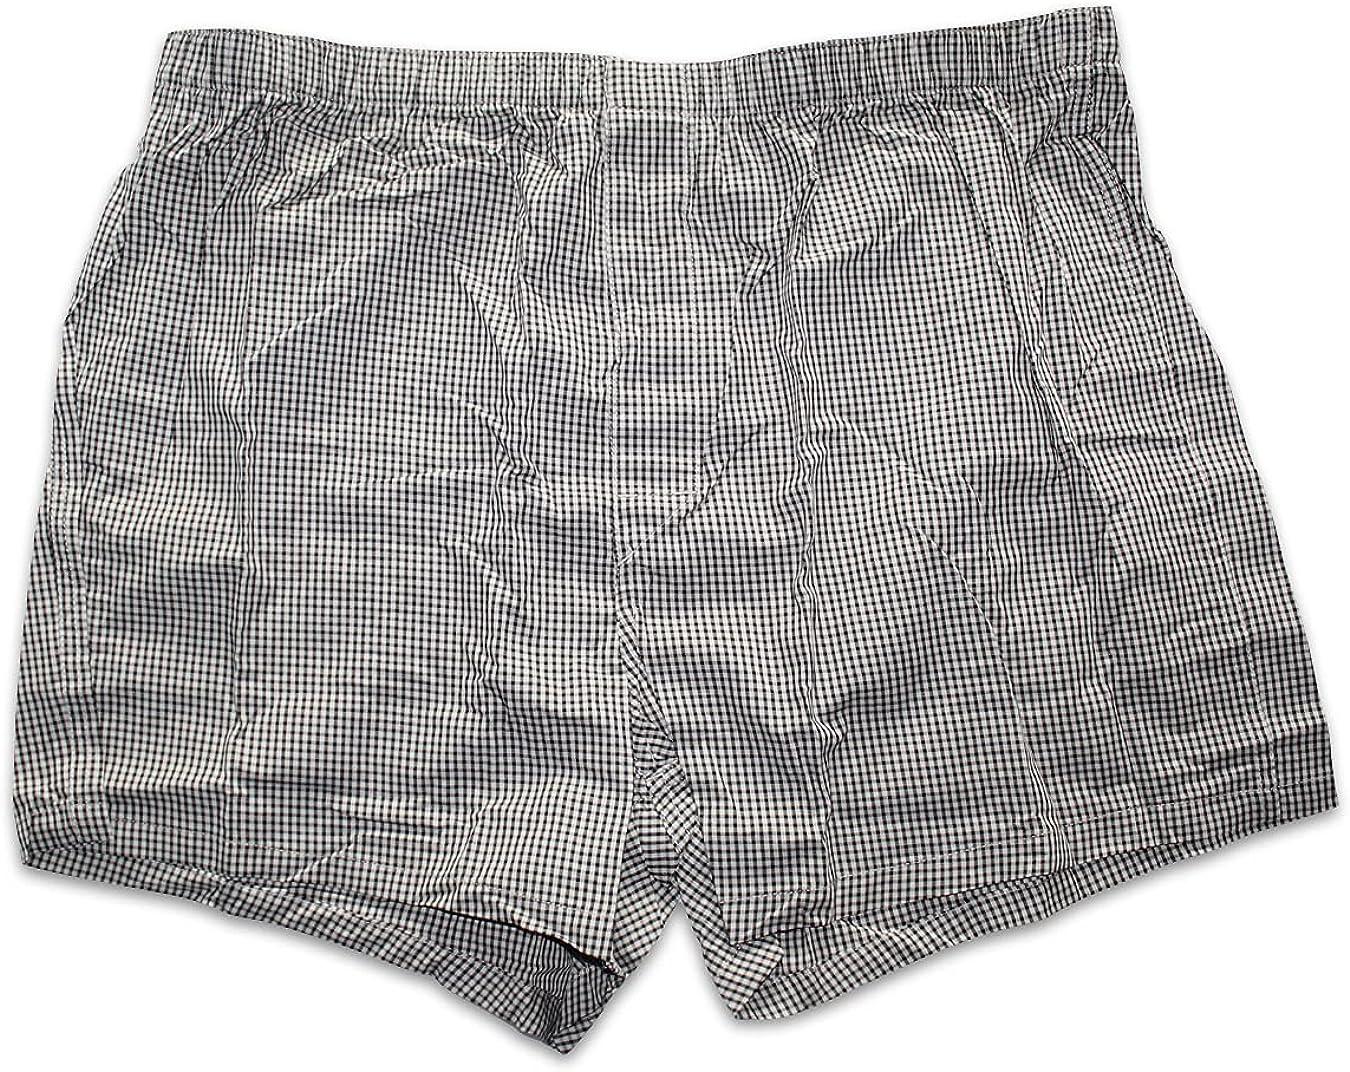 Banana Republic Men's Boxer Shorts Mens XL Extra Large X-Large 1 Boxers Underwear